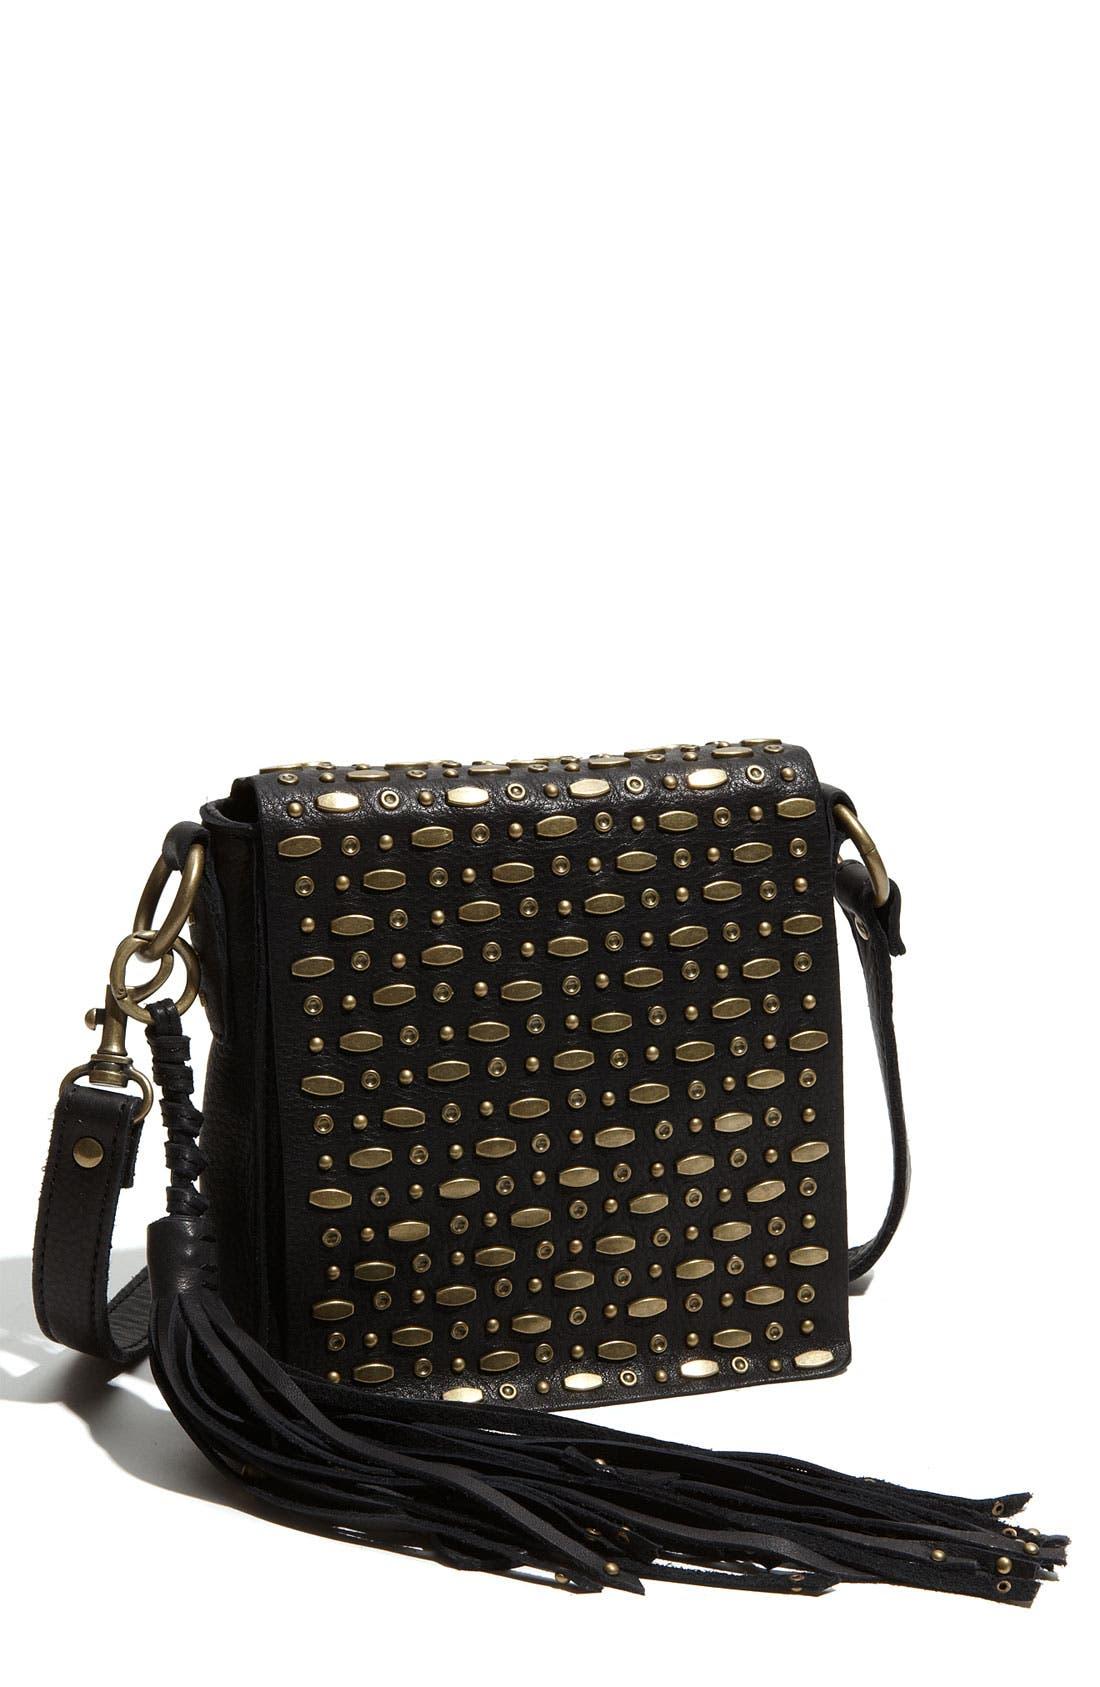 Main Image - Revel NY 'Nolita' Crossbody Flap Bag